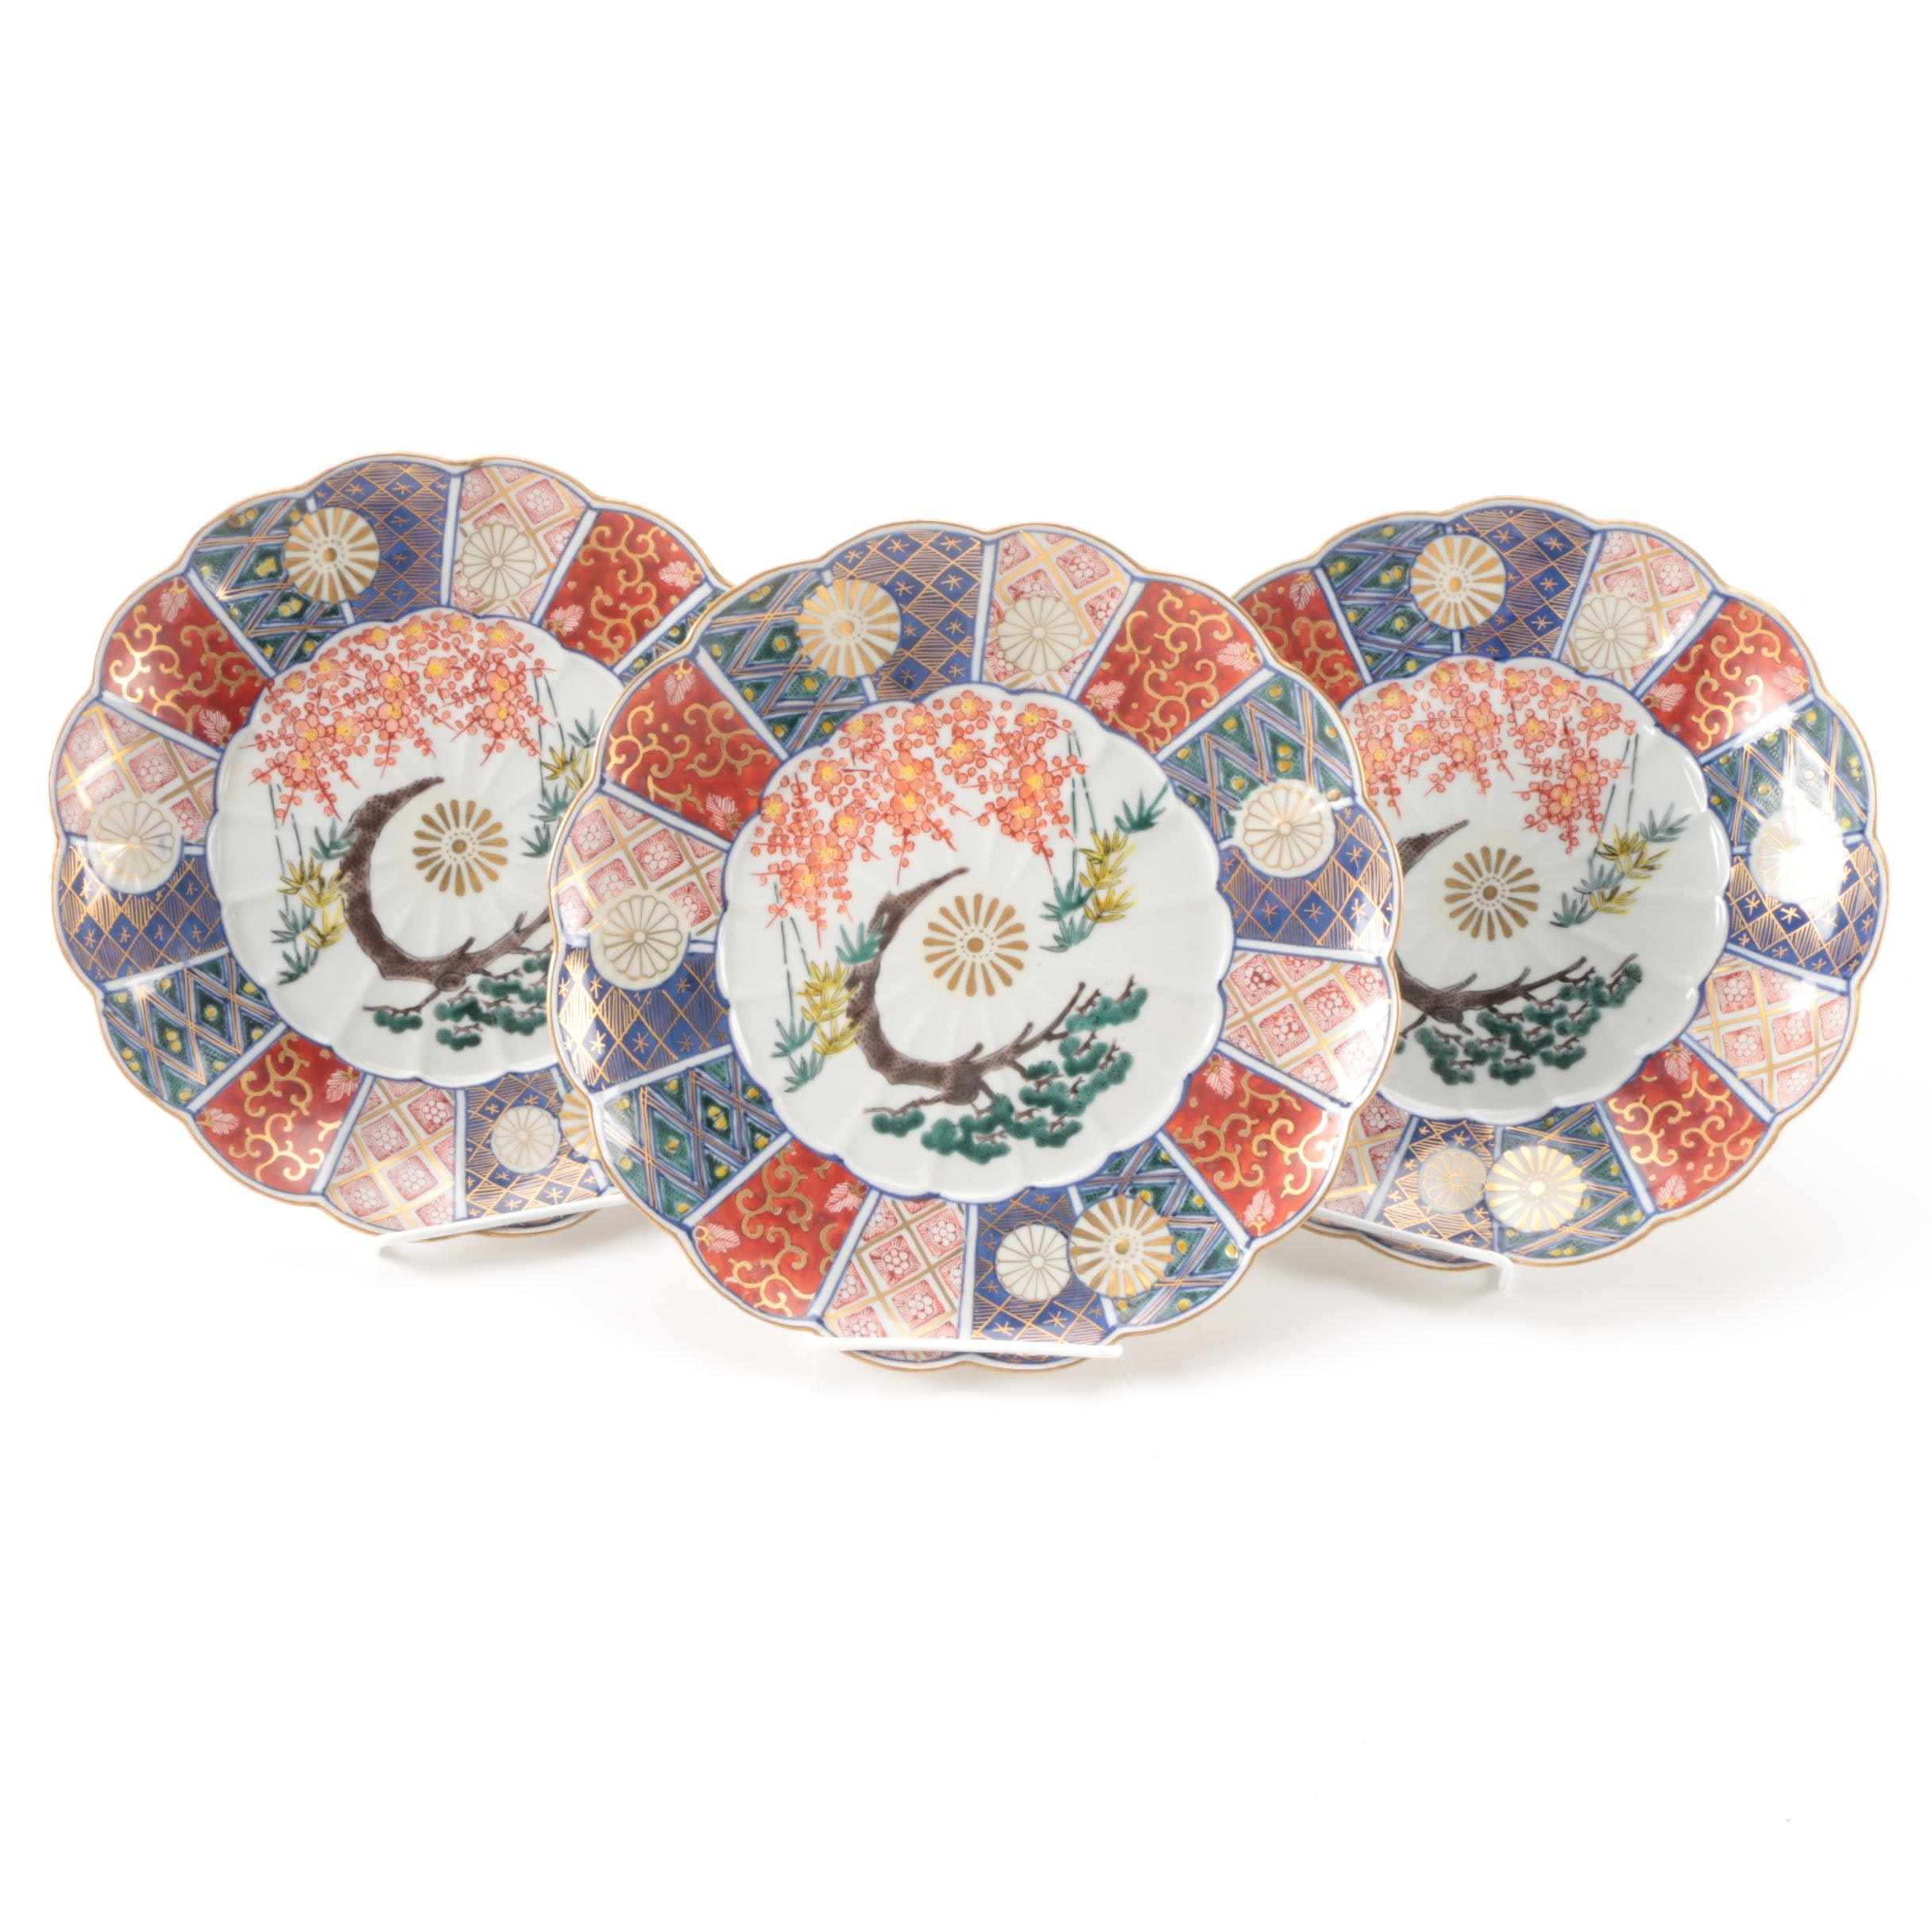 Imari-Style Decorative Plates